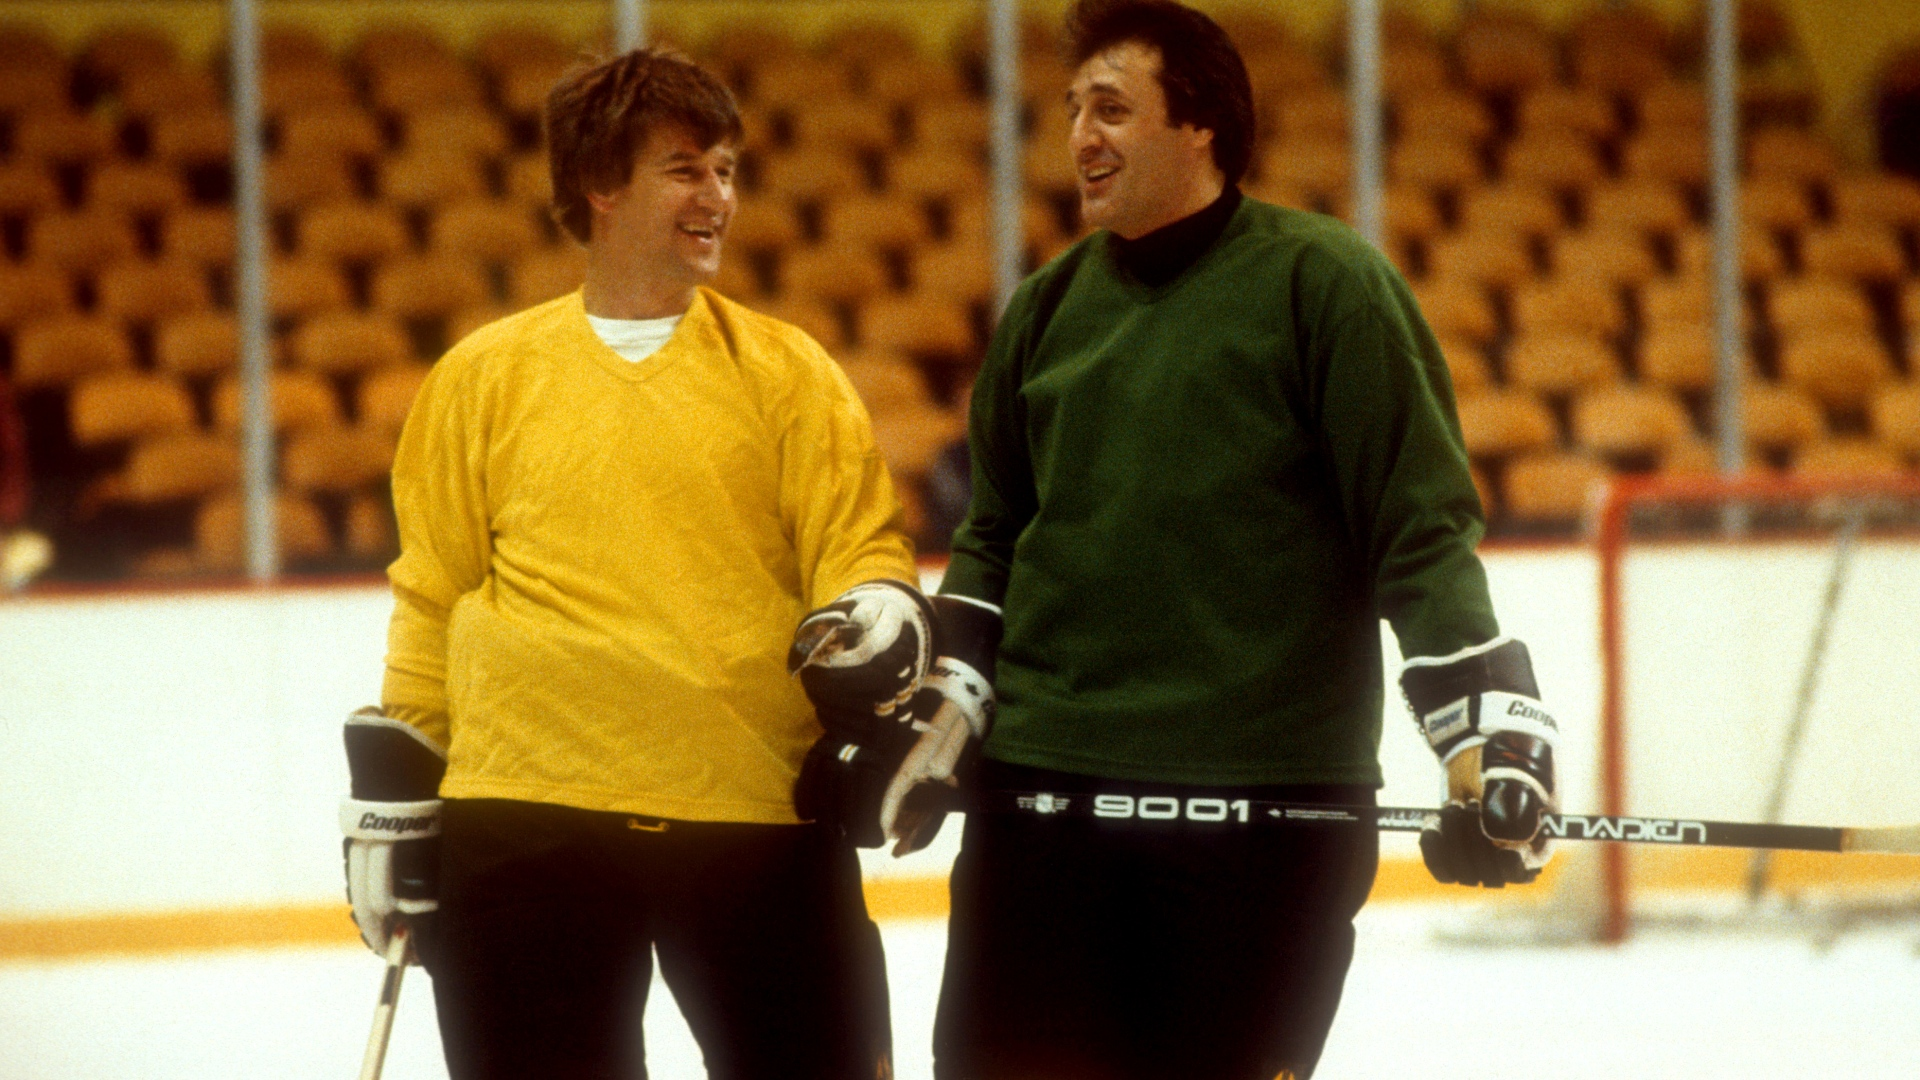 Bobby Orr et Phil Esposito